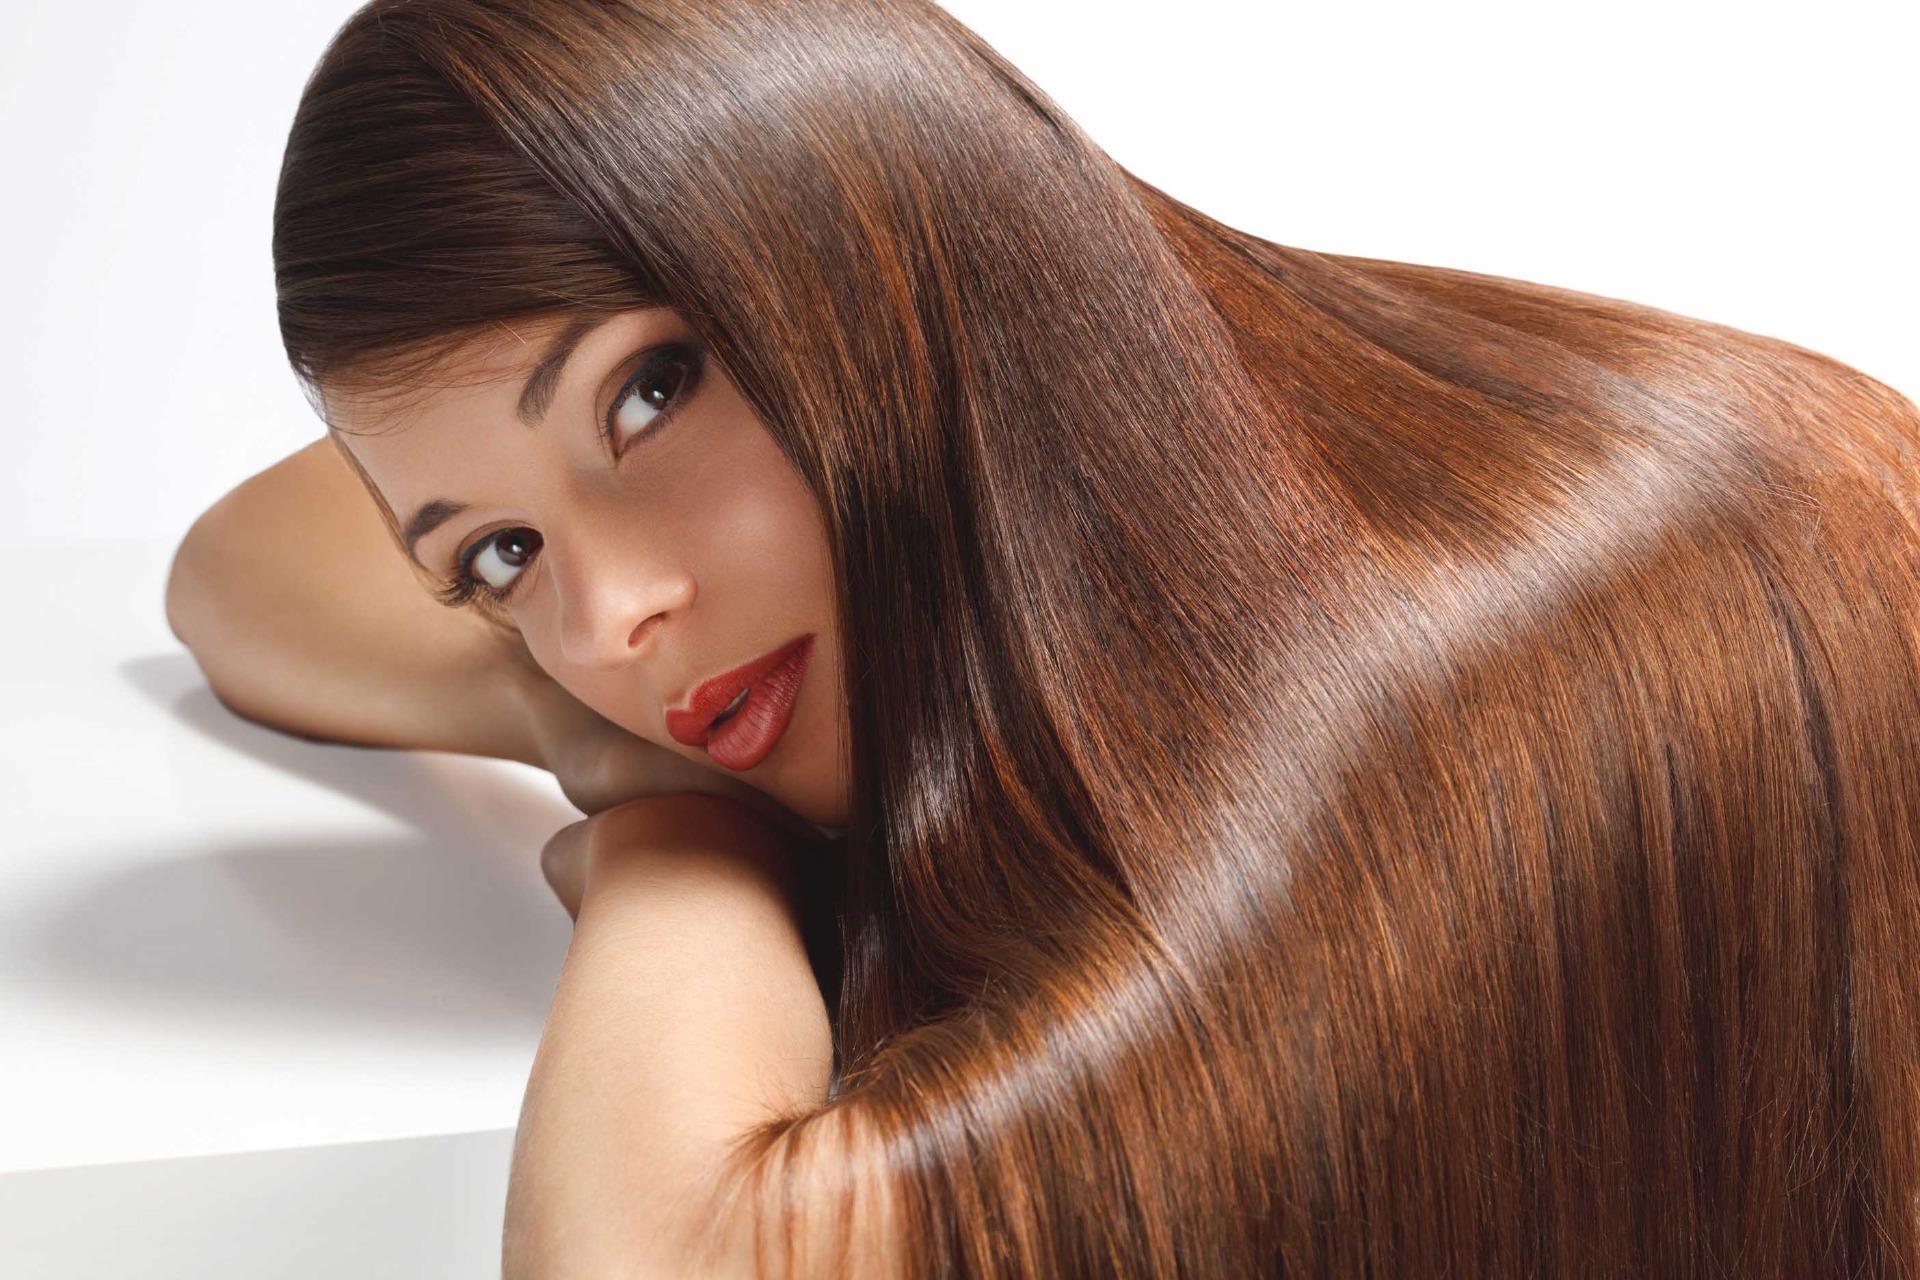 Hairdresser barber hair salon hairstyle print - Barber vs hair salon ...